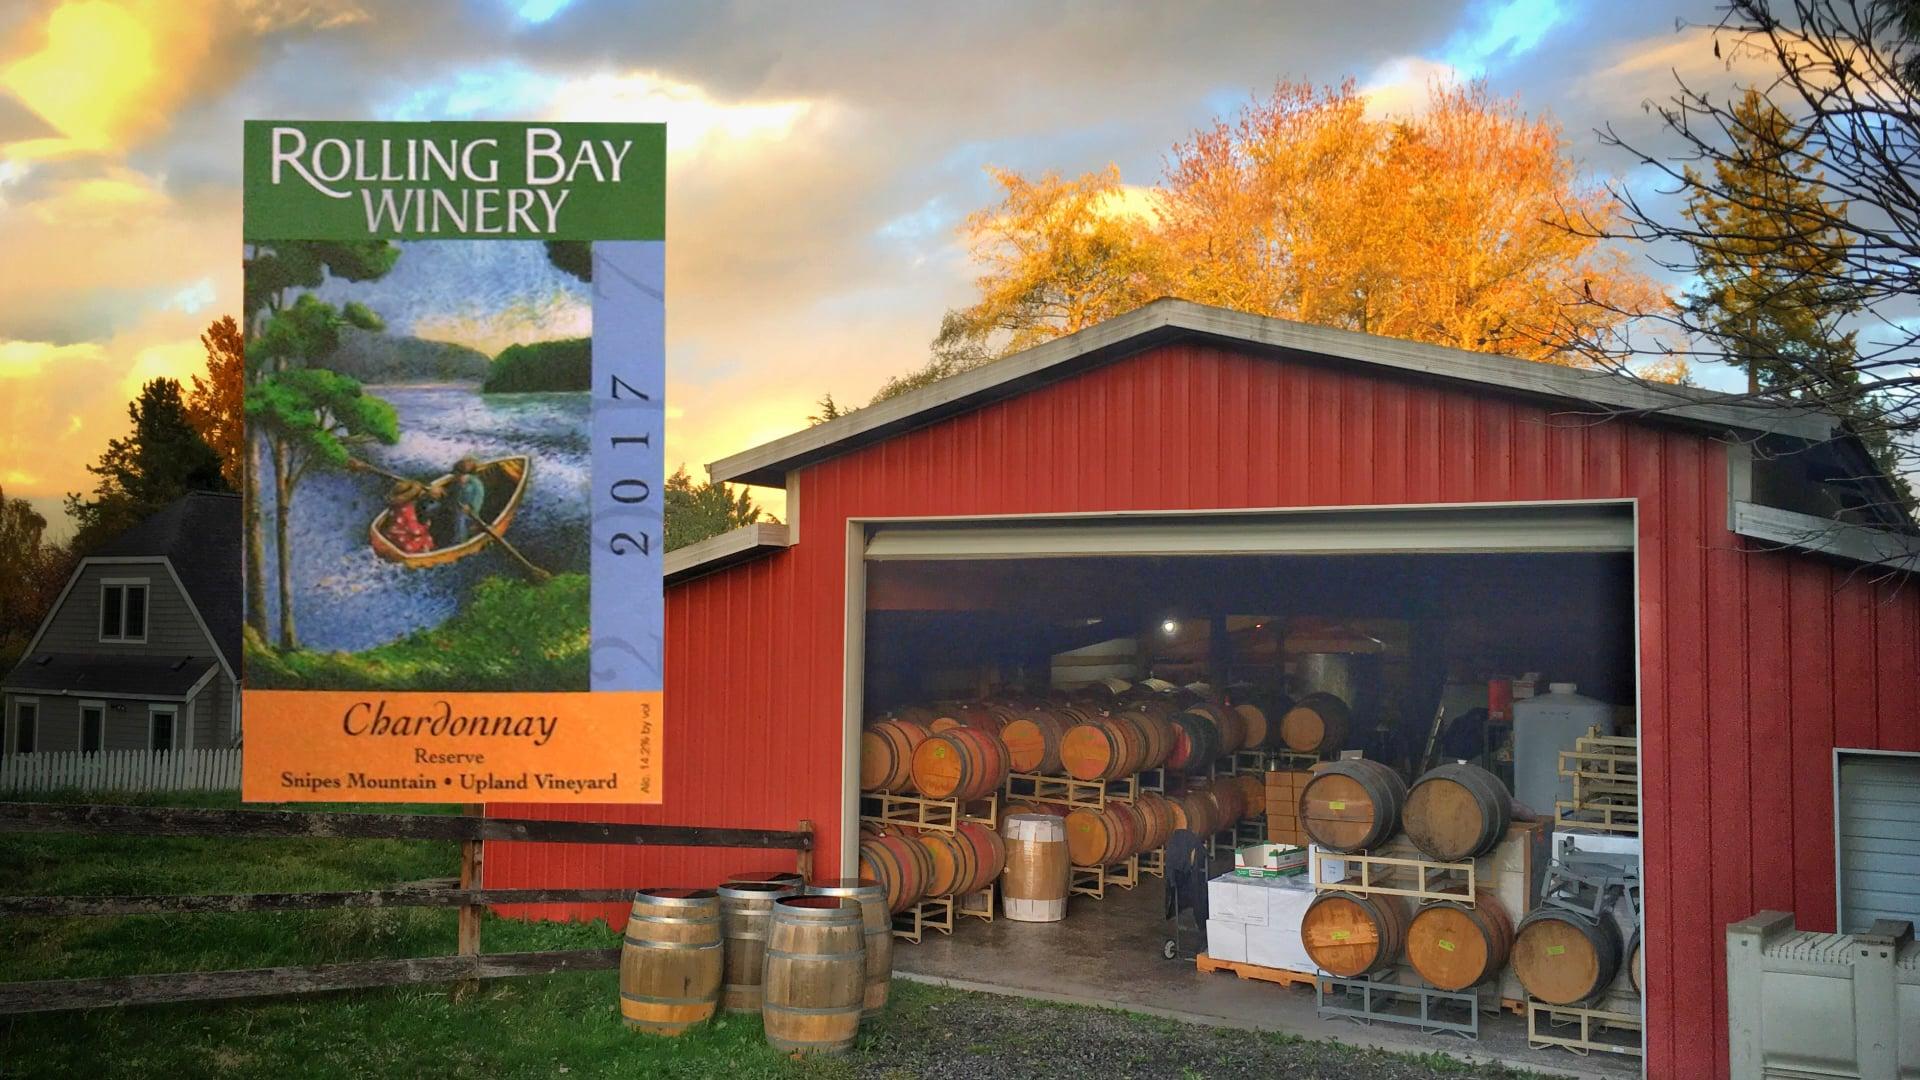 Rolling Bay Winery / Chardonnay Bottling